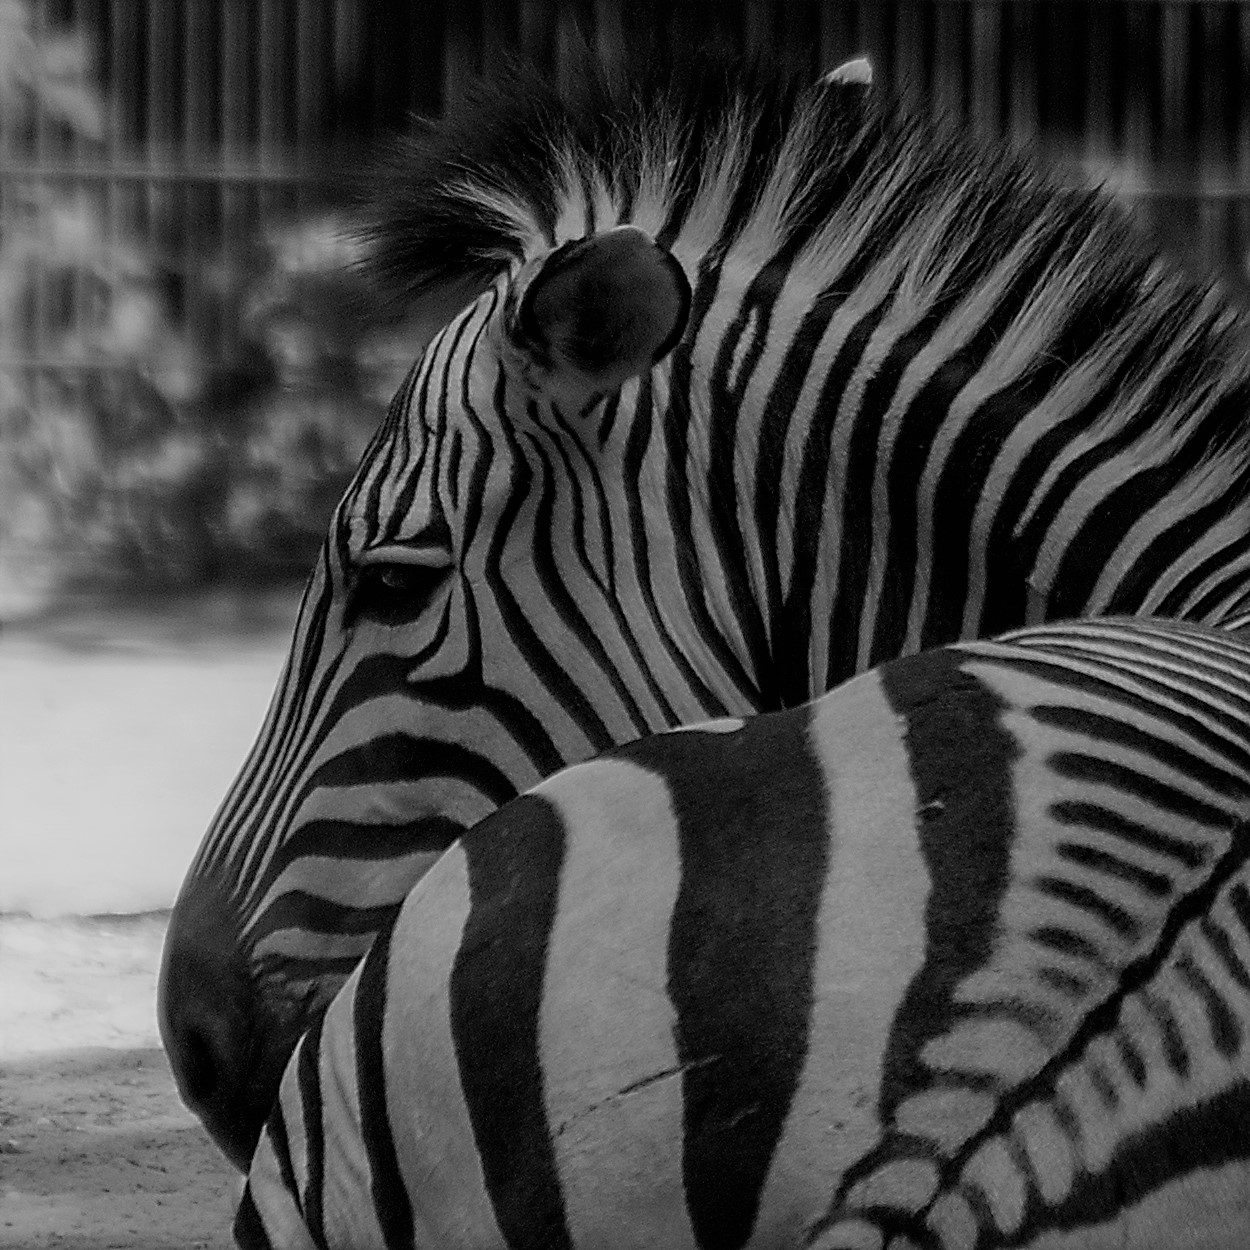 Zebra (Foto: Gisela Moutschka)